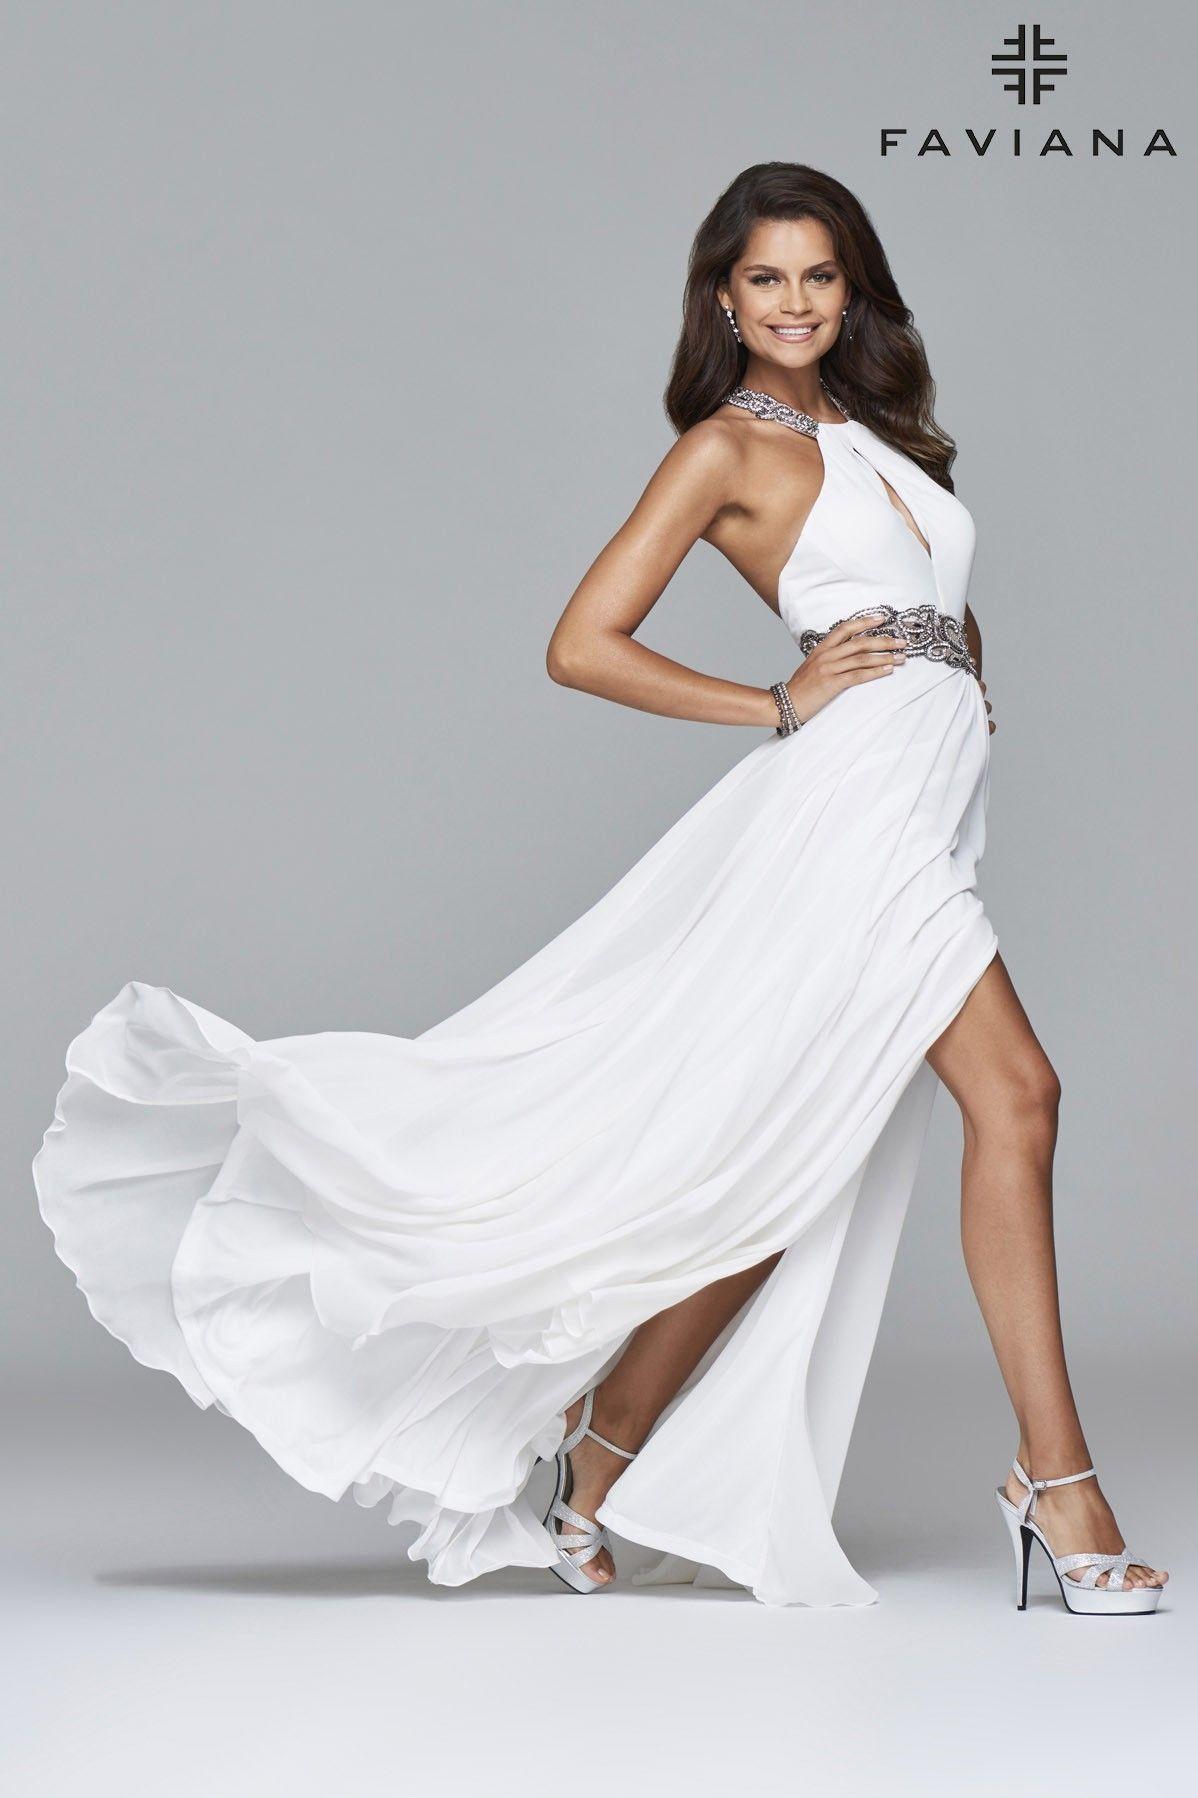 Long chiffon dress with beaded neckband and waistband faviana